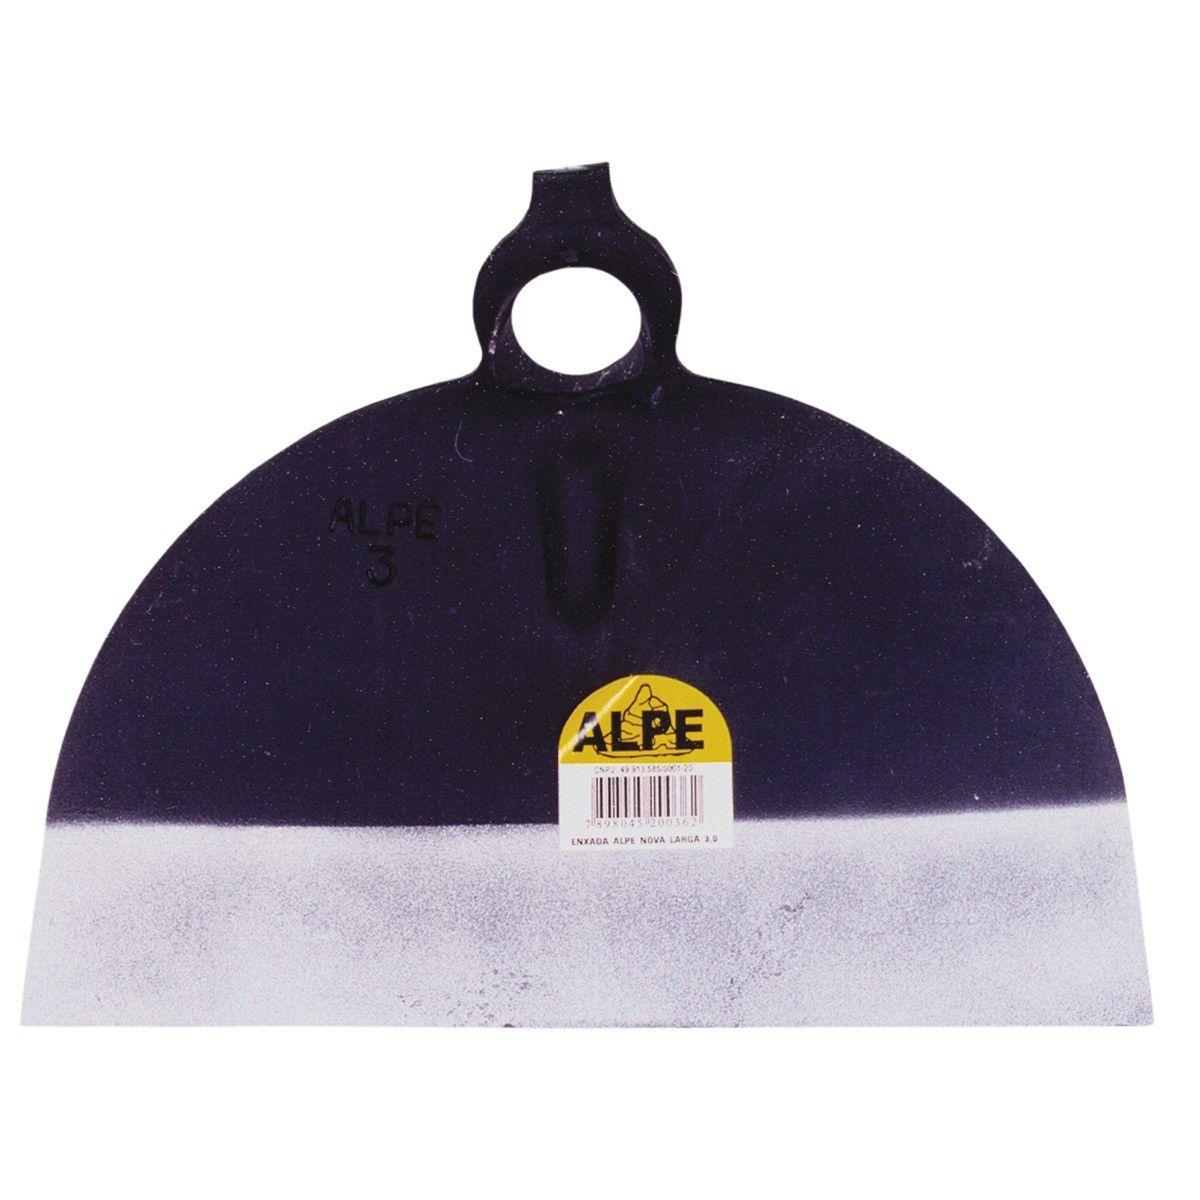 Enxada Alpe Nova S/ Solda 3,0 Libras Larga Cx/6